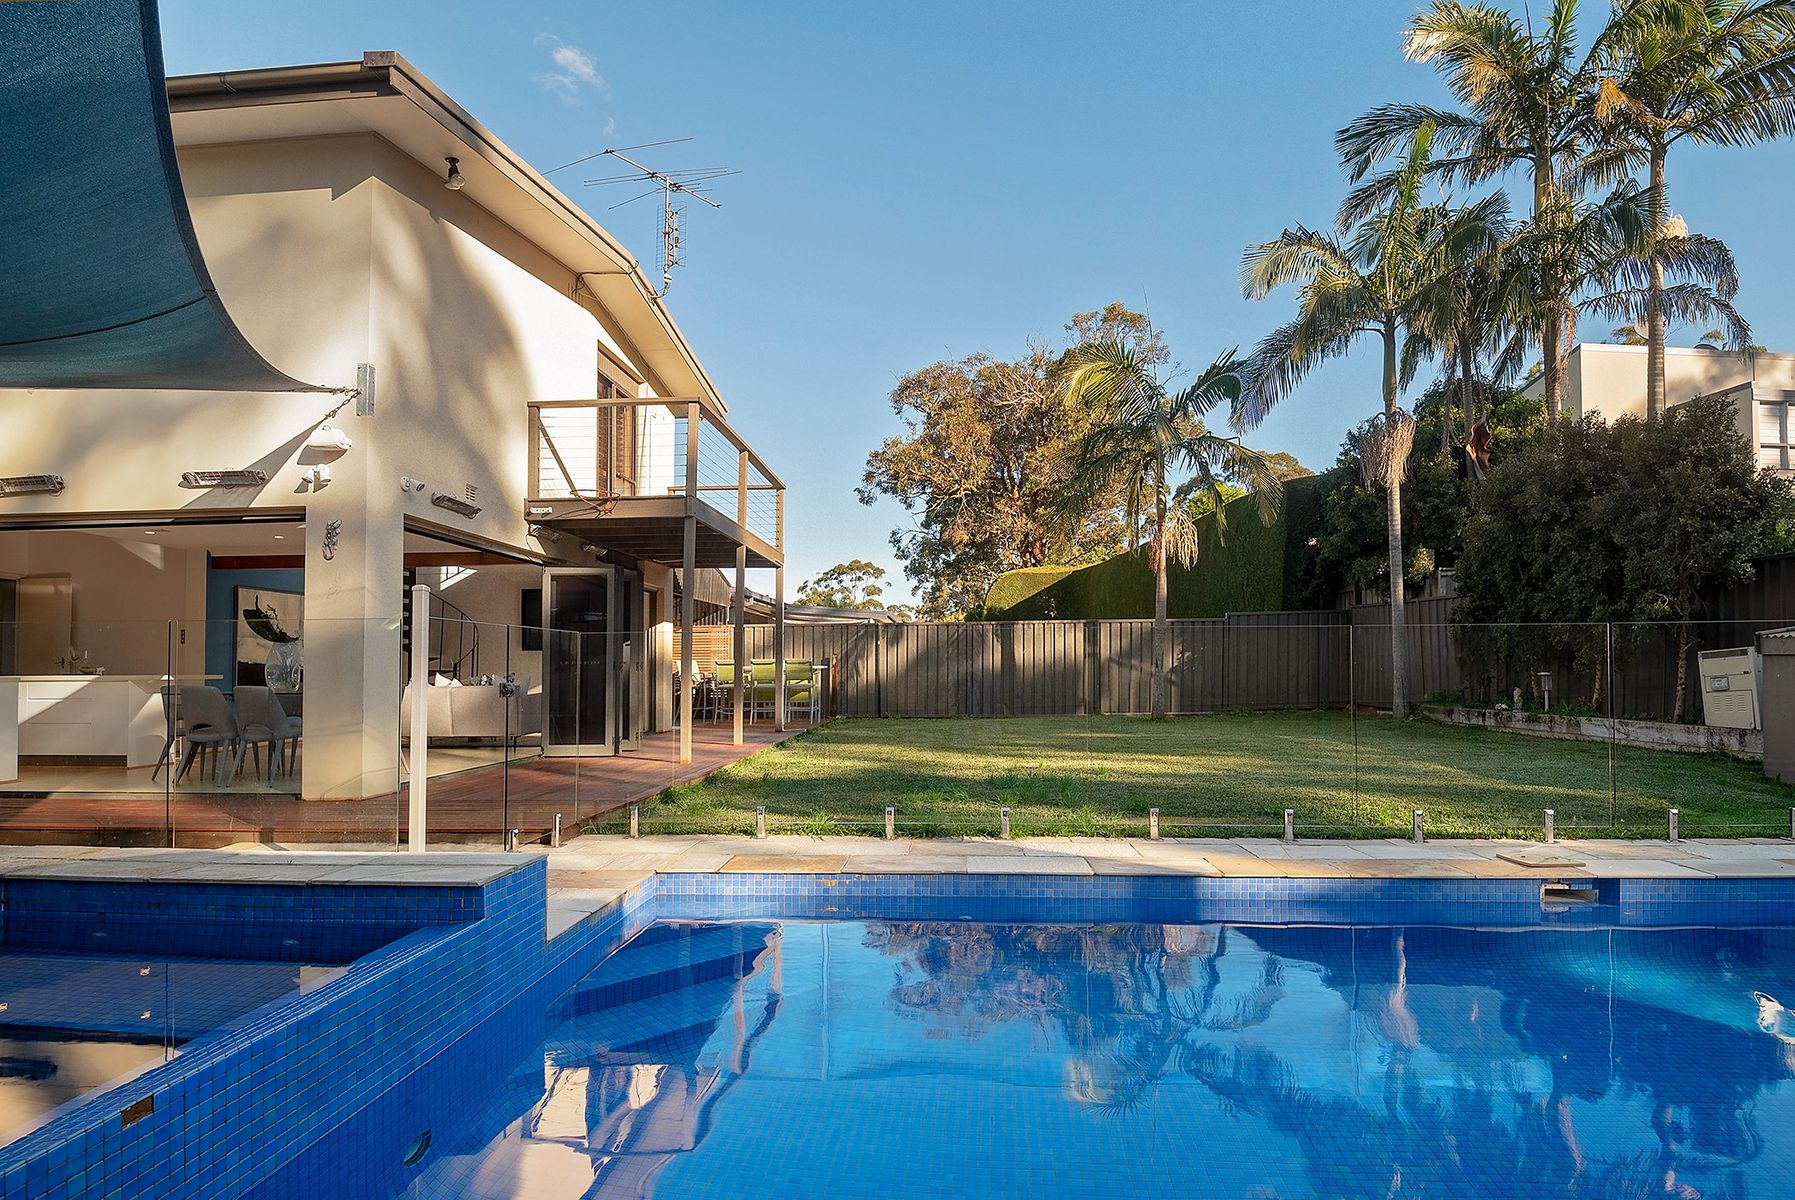 111 Prince Charles Road, Belrose, NSW 2085